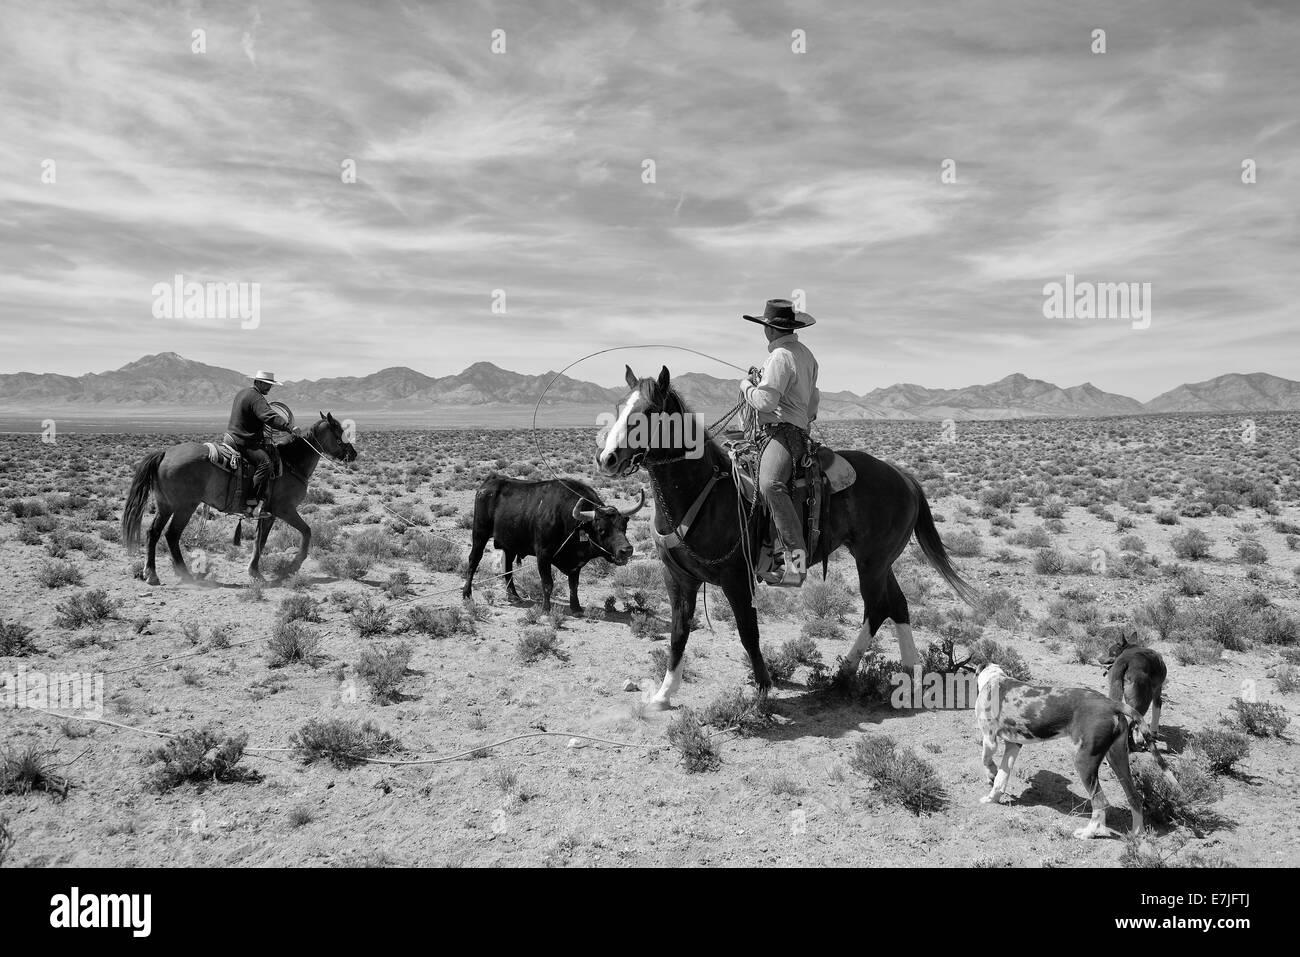 Cowboys Stockfotos & Cowboys Bilder - Alamy